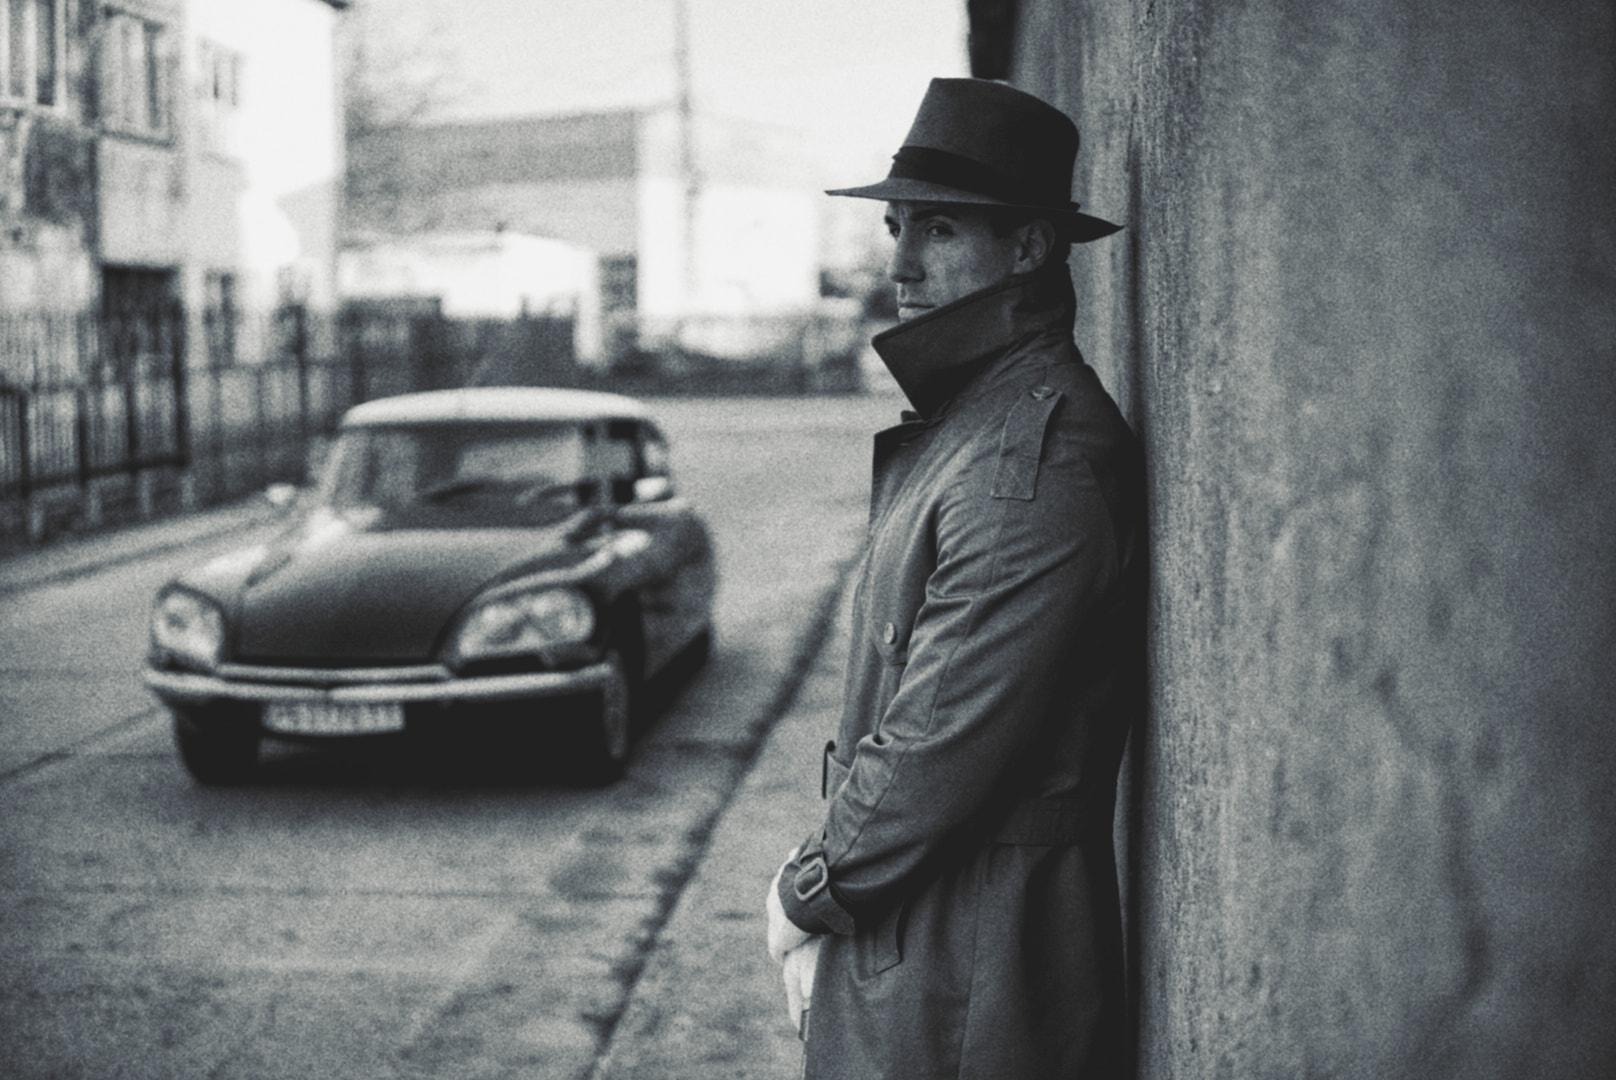 Photo in Portrait | Author Valentin Ivanov - sValio | PHOTO FORUM